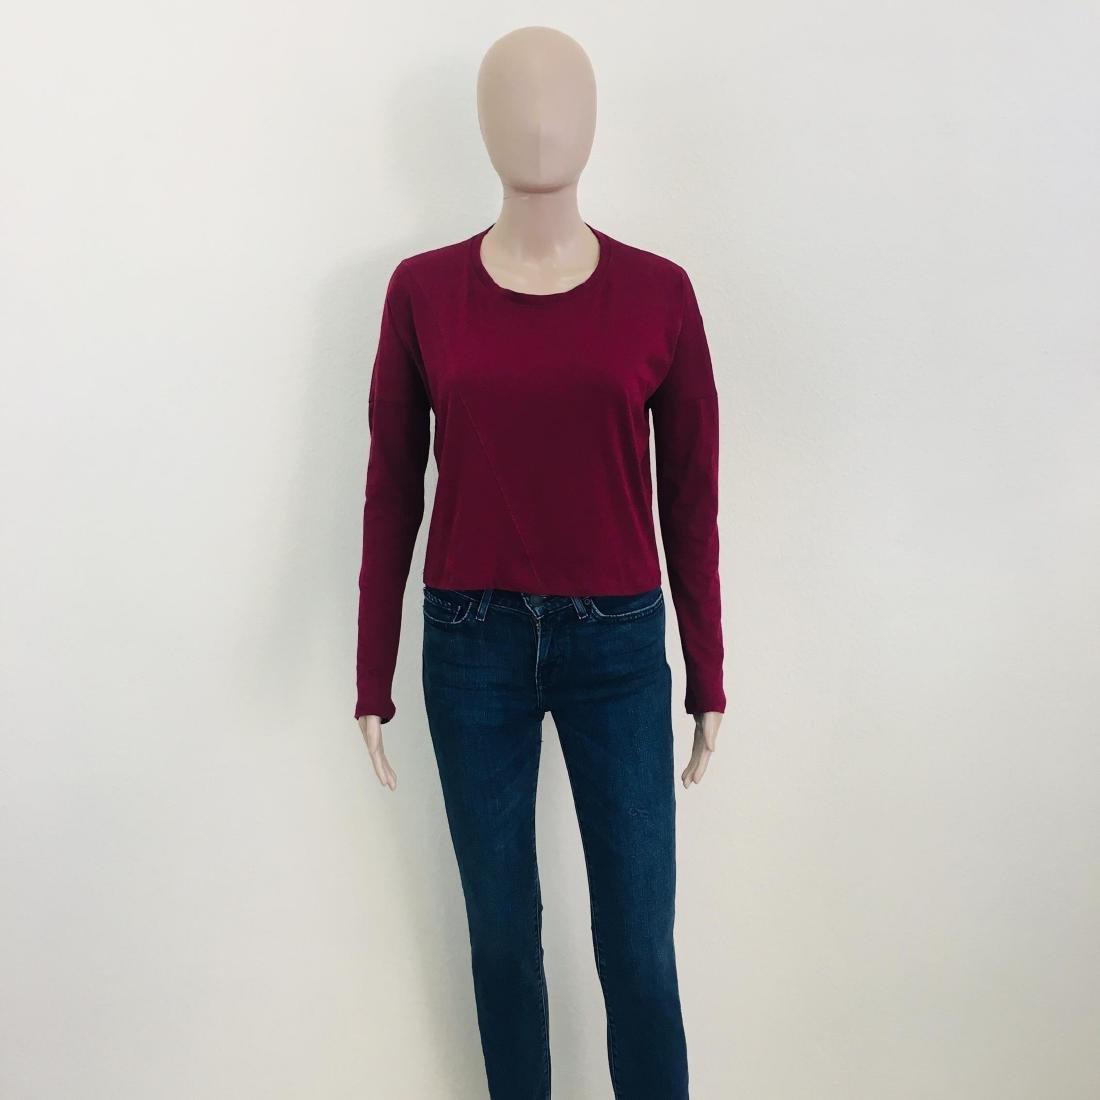 New Women's ZARA Top Blouse Size S - 2